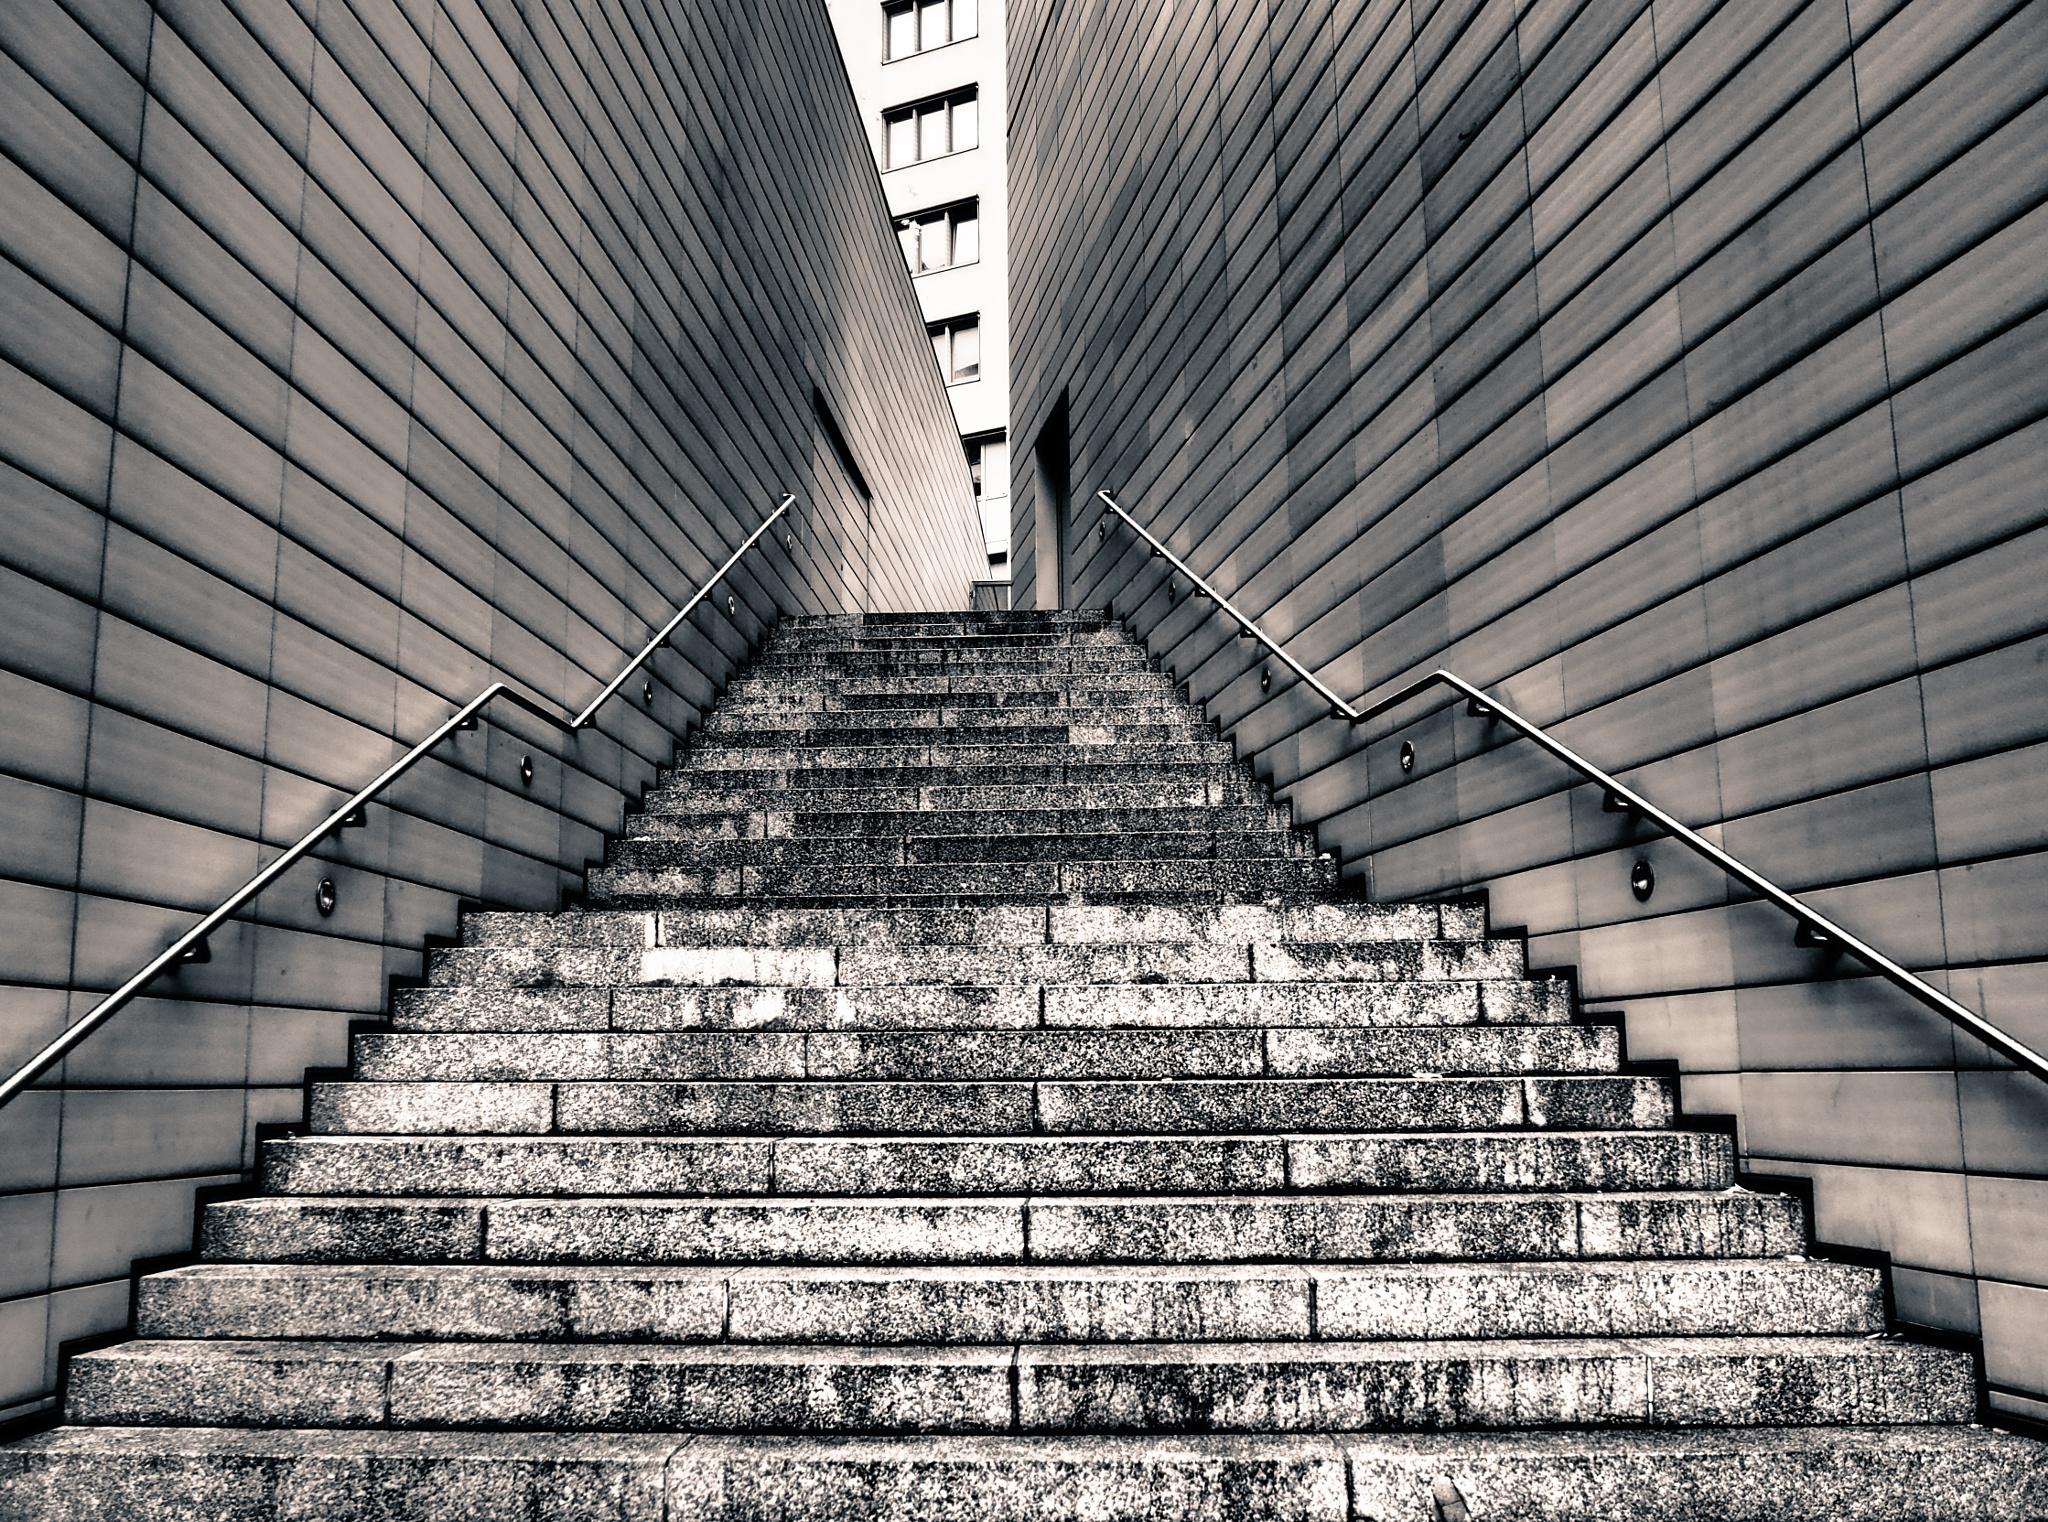 Berlin Potzdamer Platz Black & White by Jeans Brown Photography / Jens Schwarz